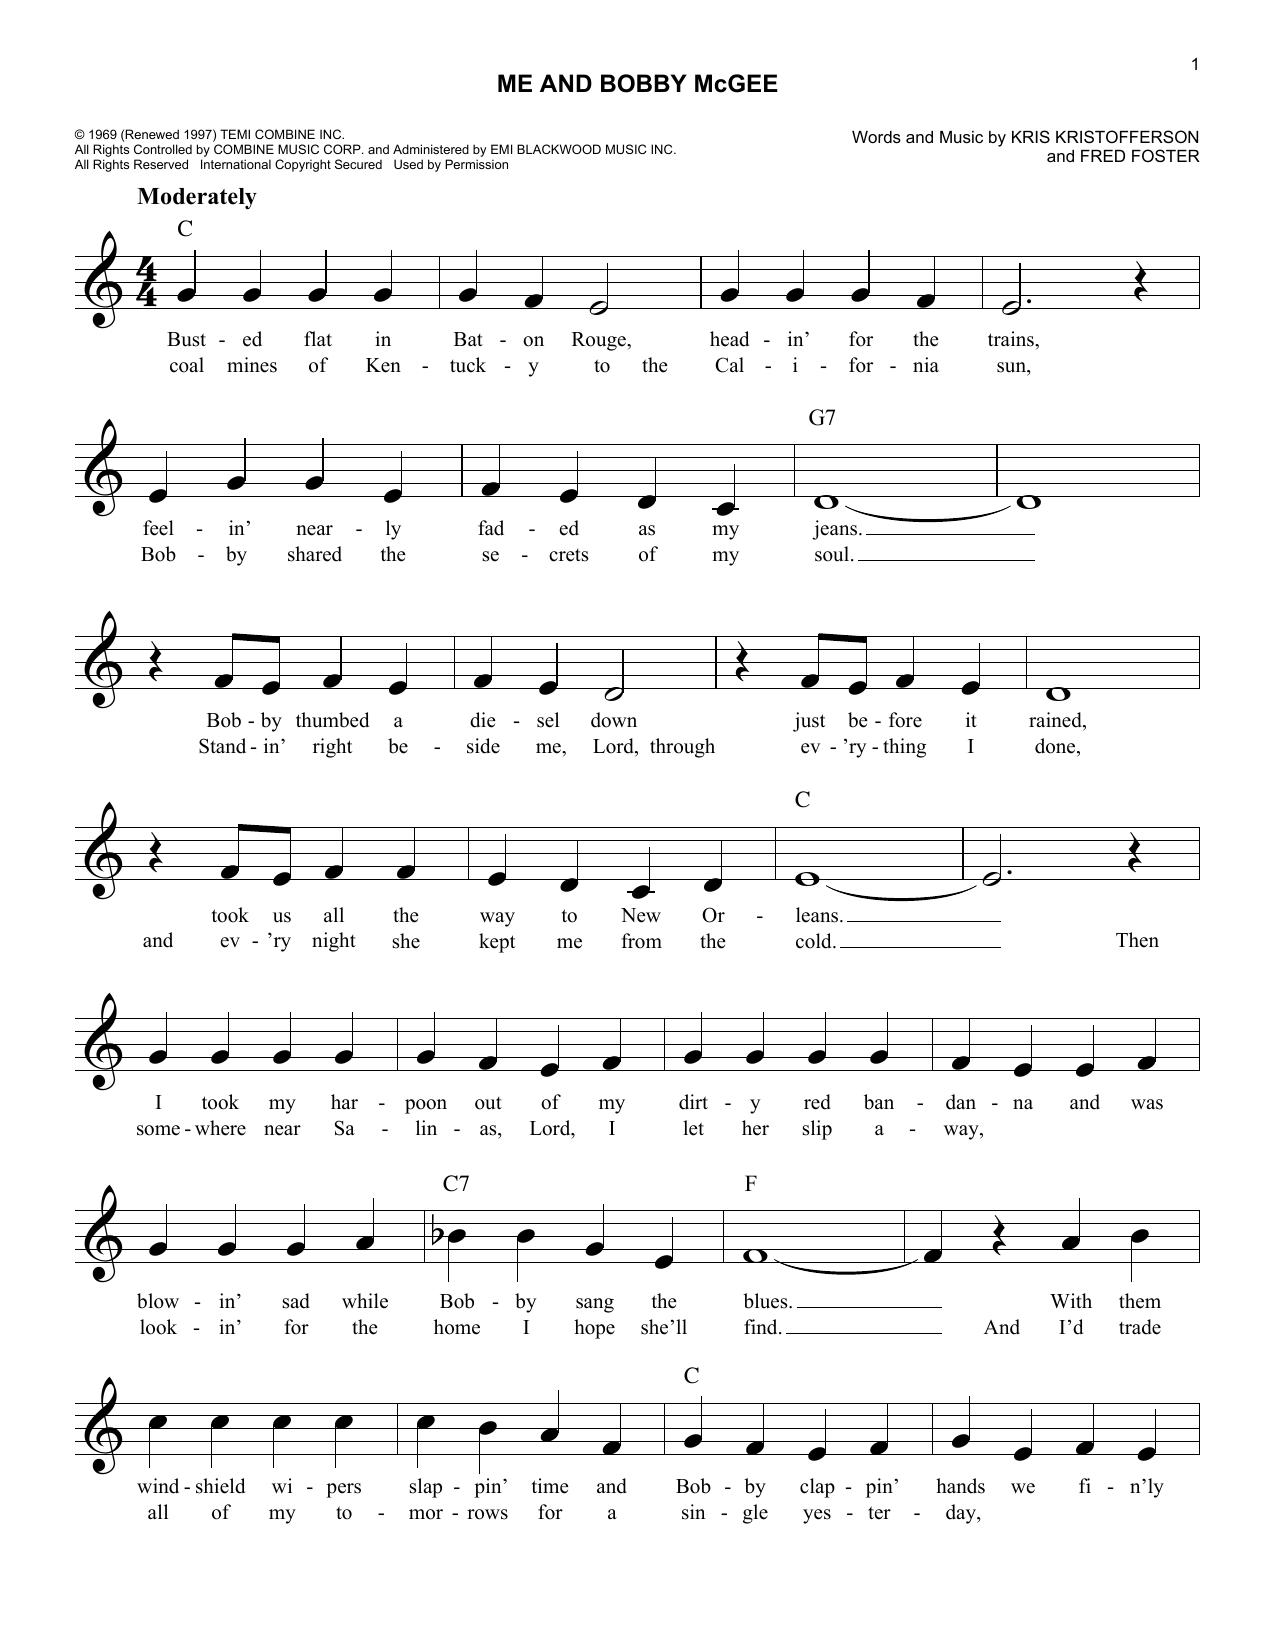 Kris Kristofferson - Me And Bobby Mcgee Lyrics | MetroLyrics